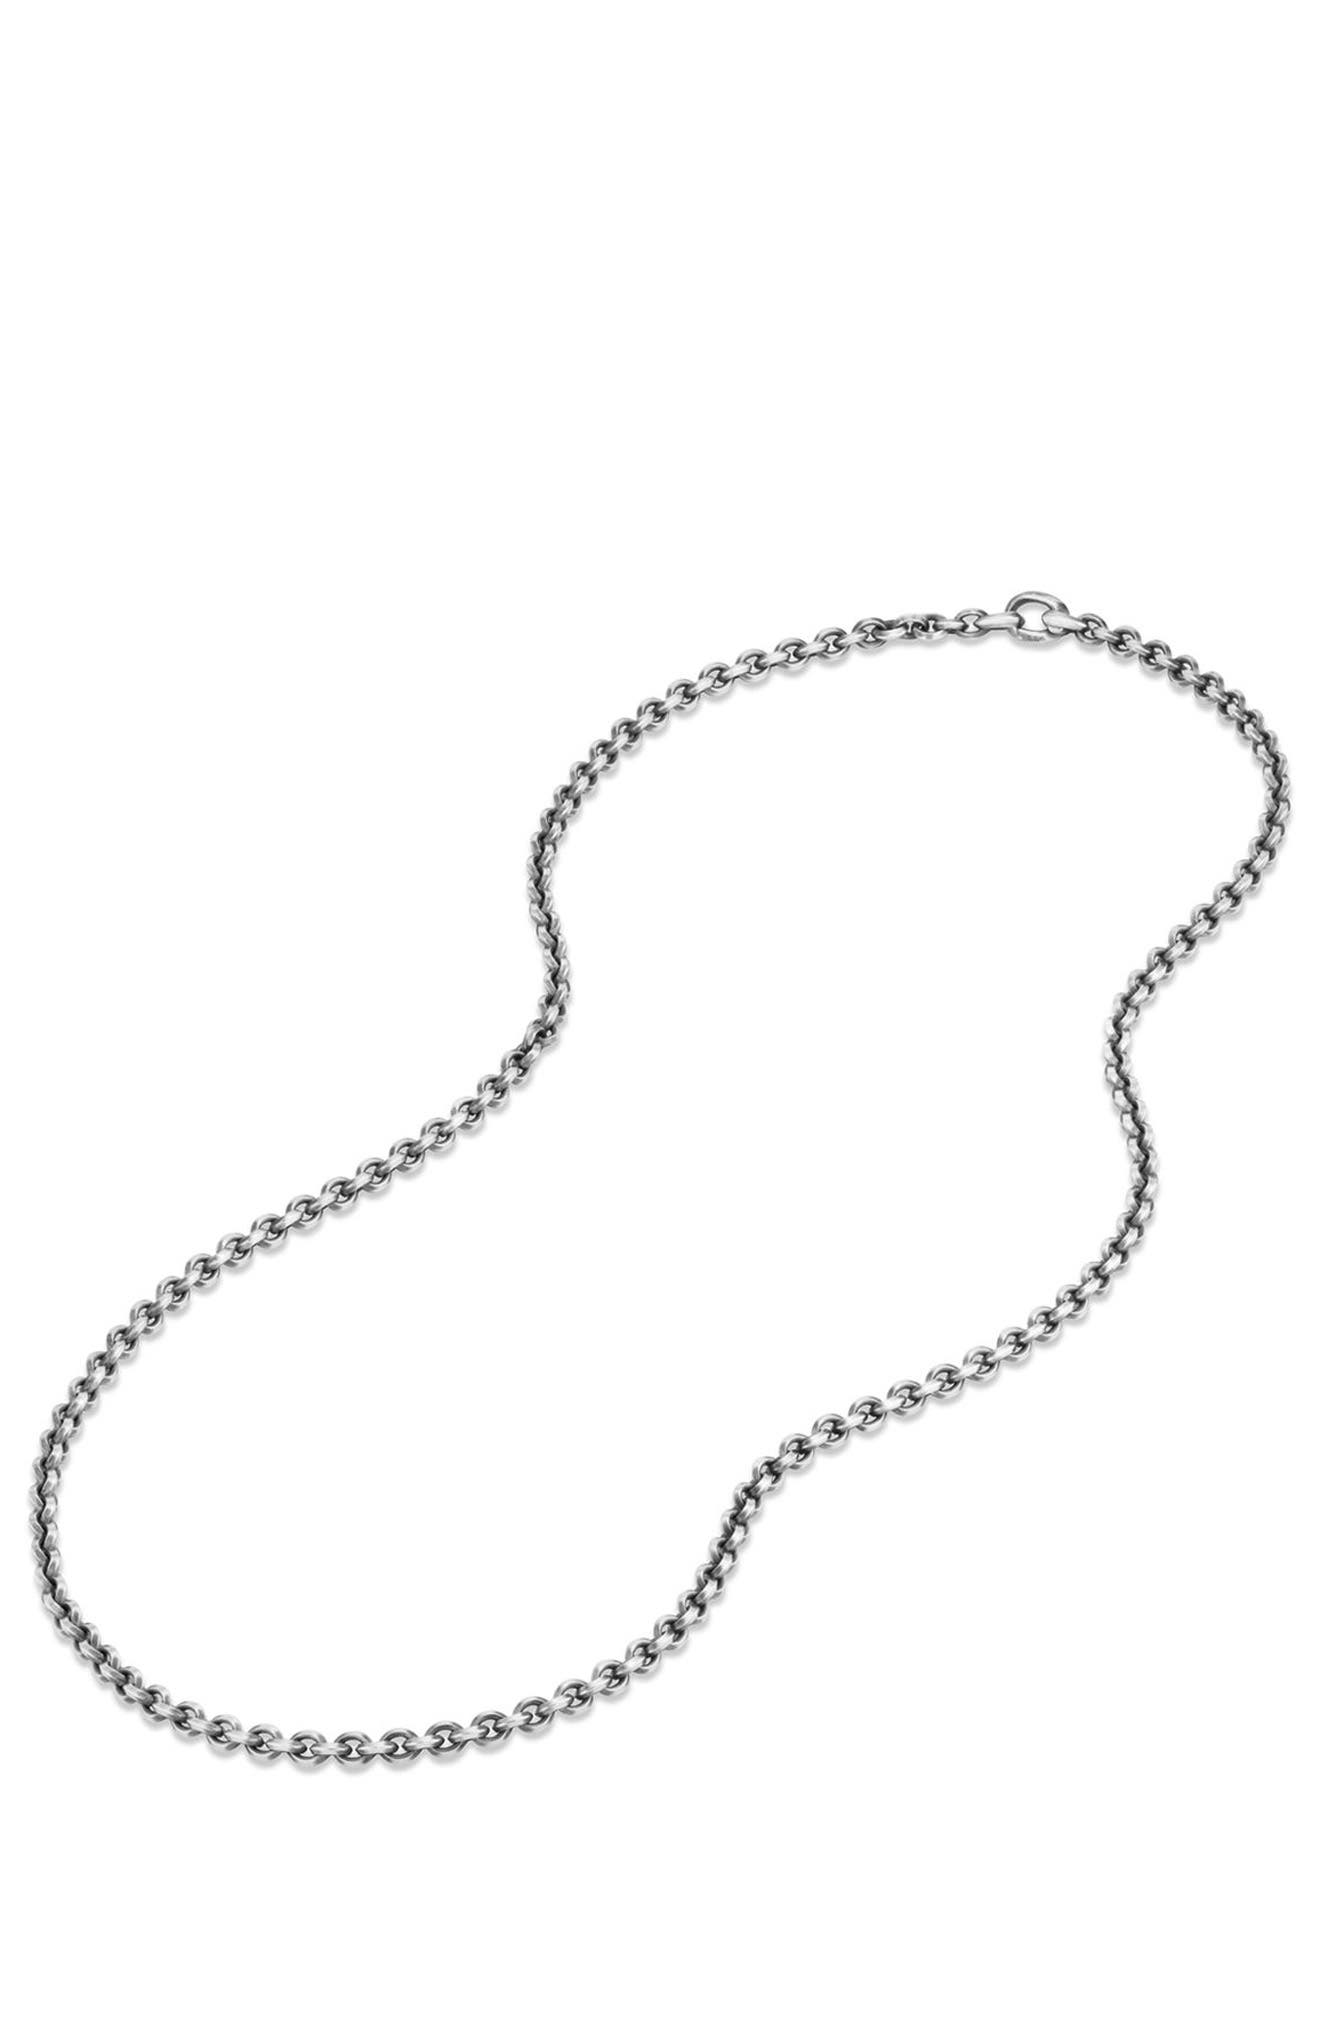 Knife Edge Chain Necklace,                             Alternate thumbnail 2, color,                             040